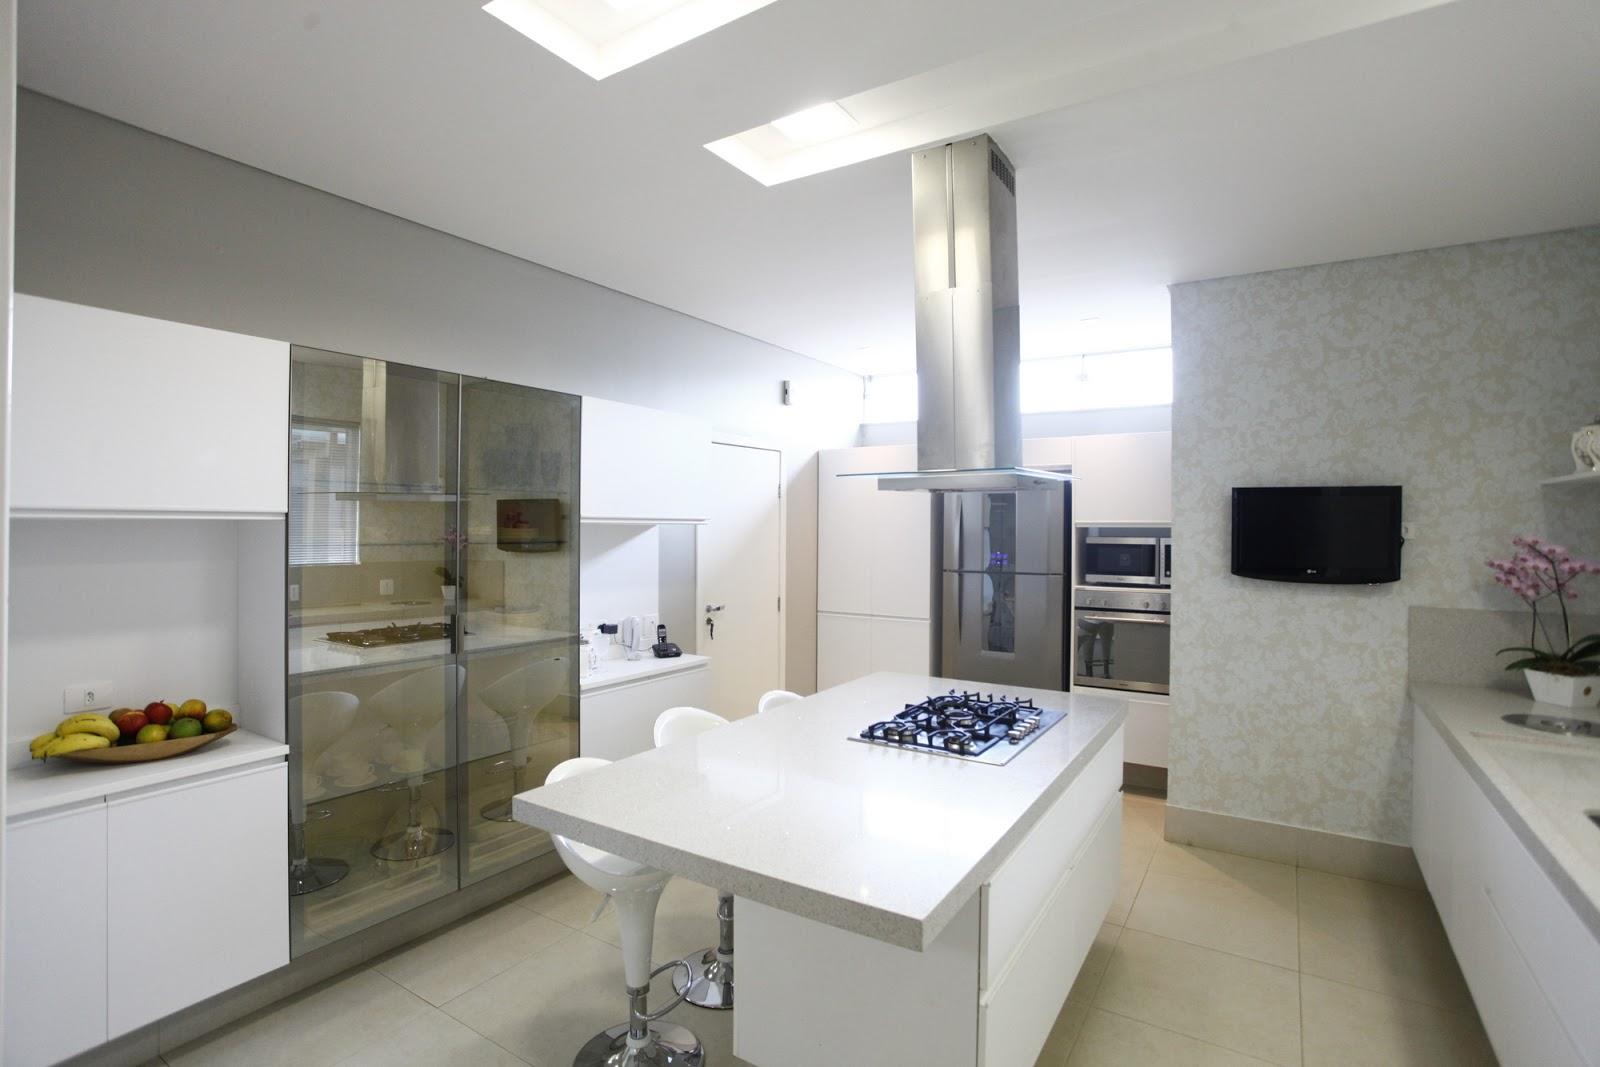 cozinha americana bancada de marmore #5A4F3D 1600 1067